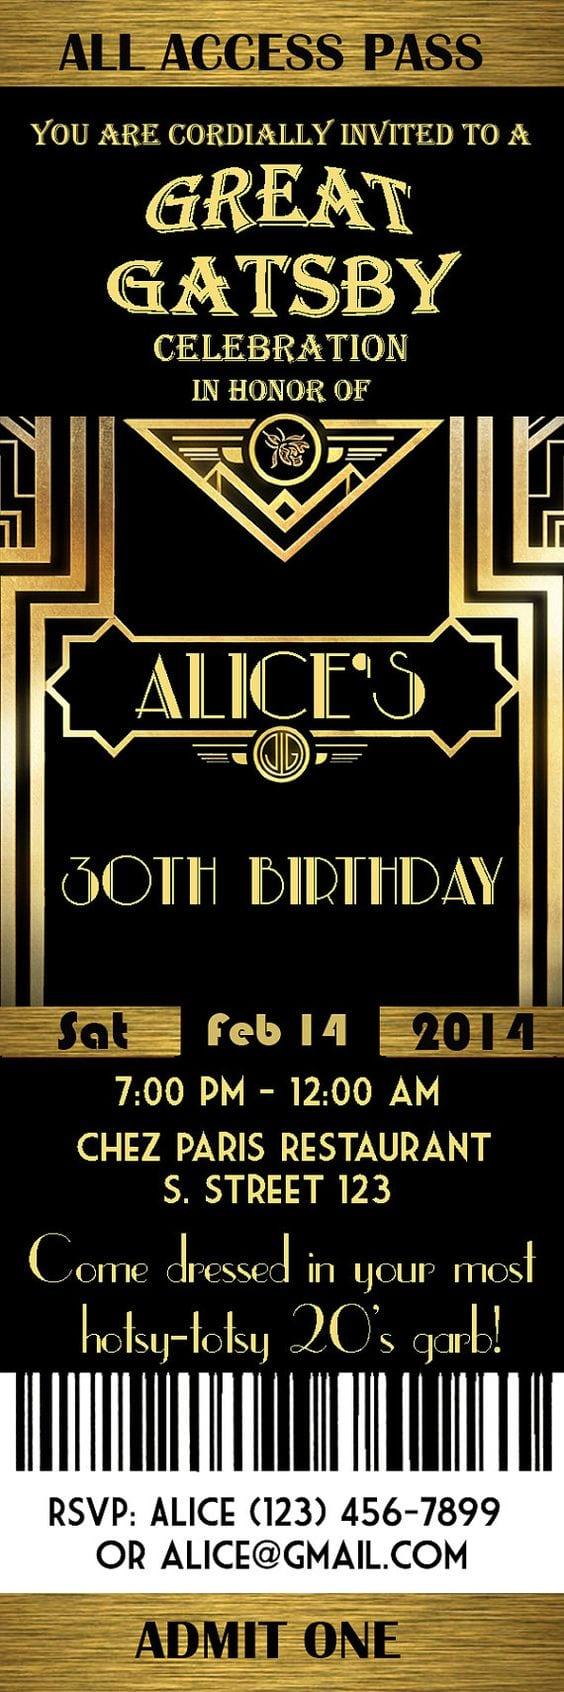 1920s Party Invites Cloudinvitation Com Themed Birthday